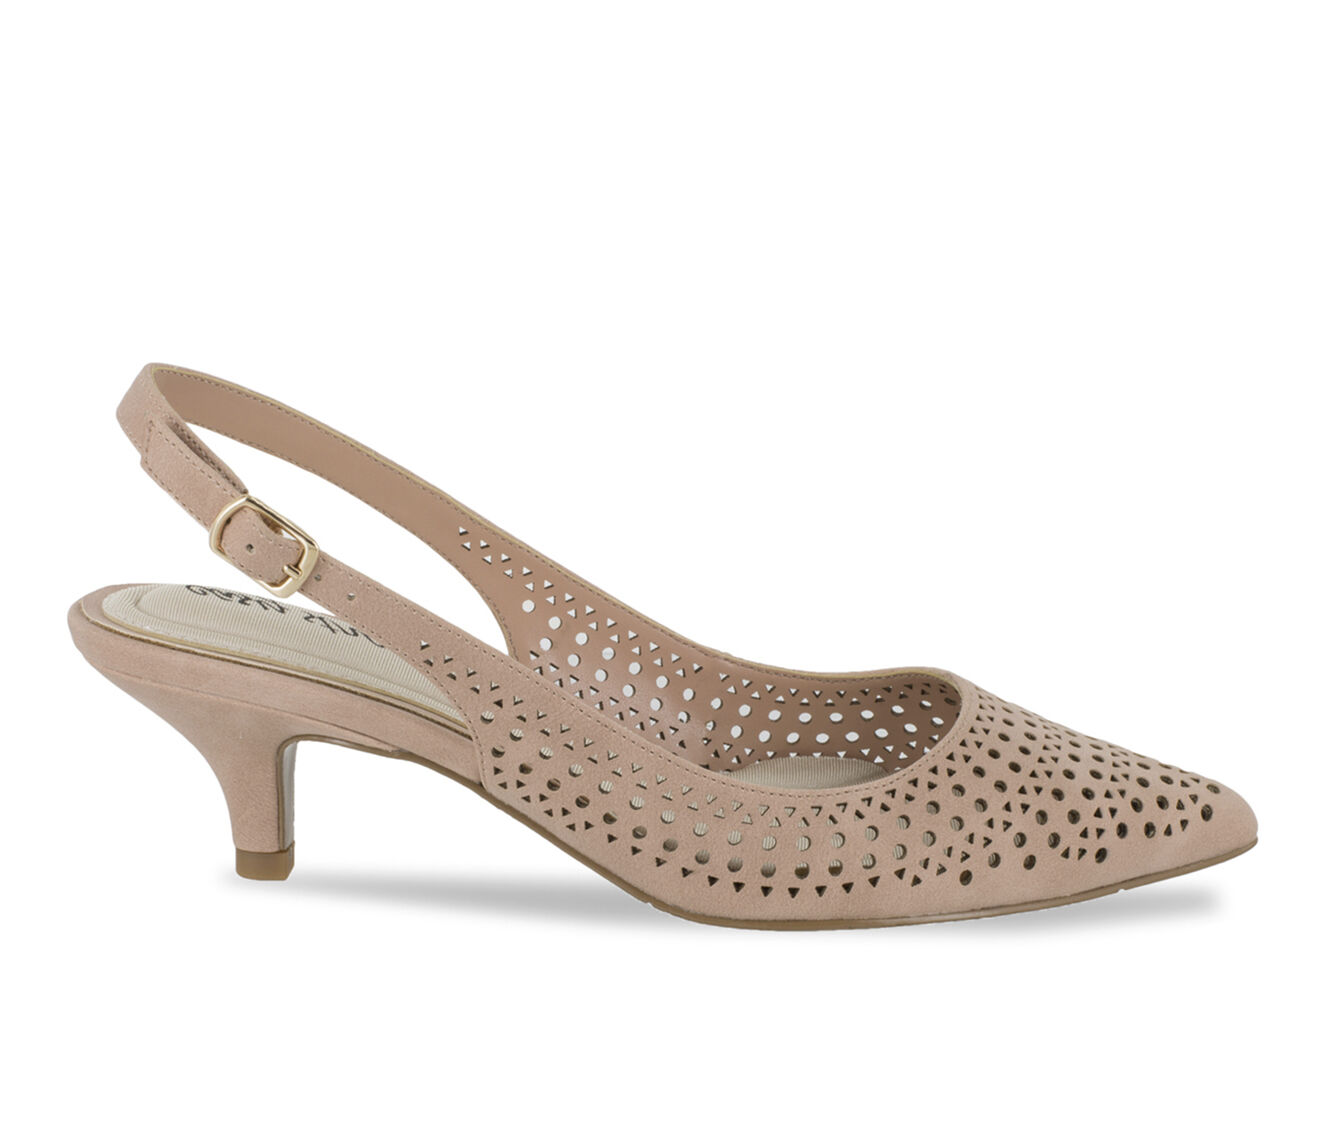 uk shoes_kd5795